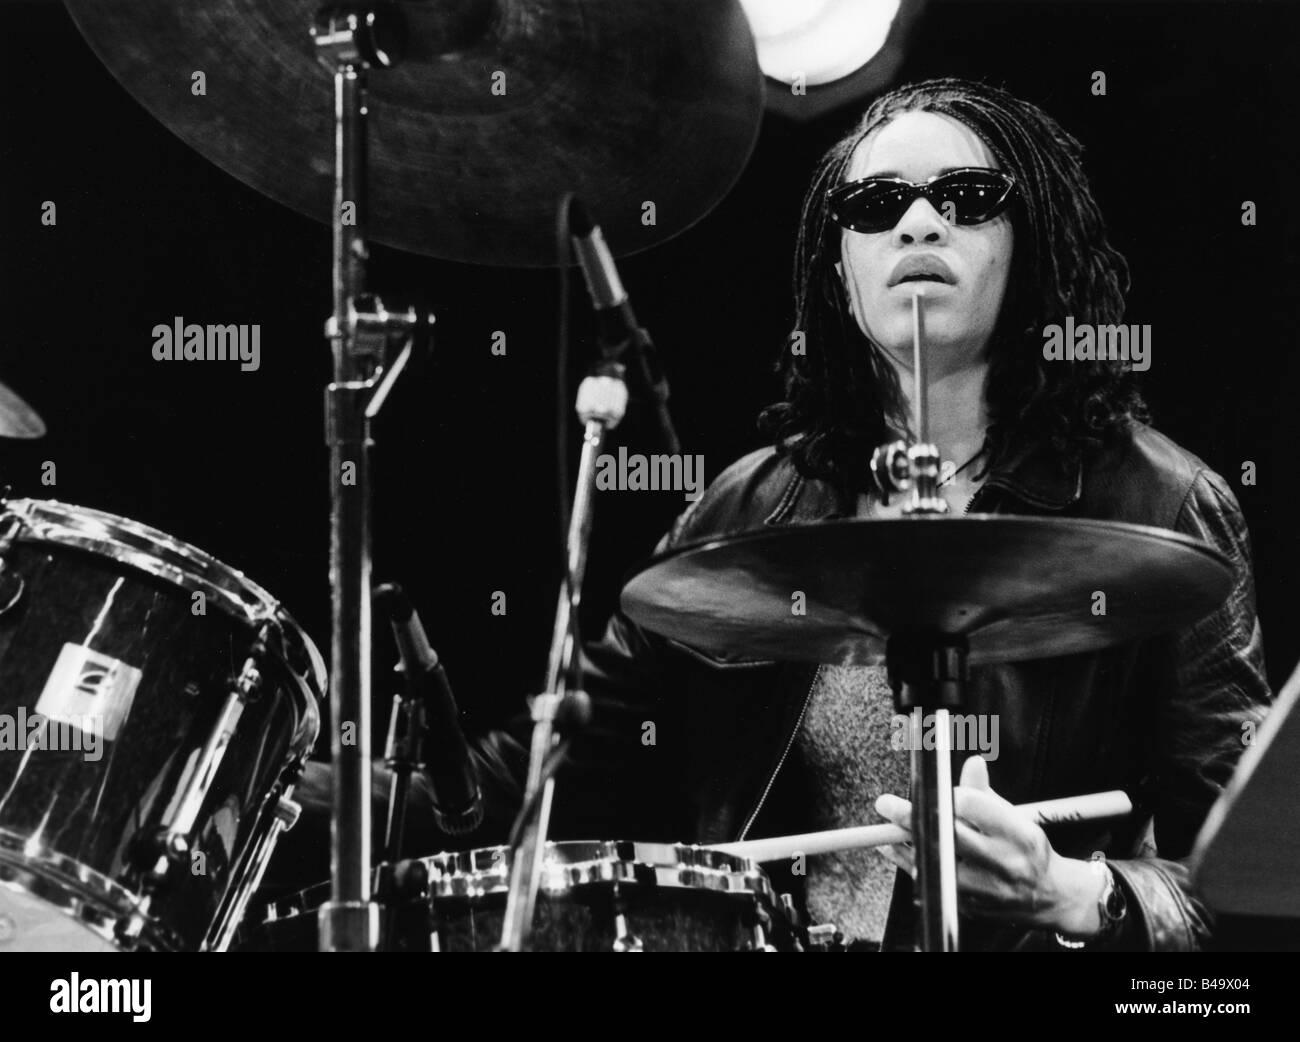 Blackman, Cindy, American musician (Jazz), half length, playing drums, live performance, Frankfurt, June 1997, Additional - Stock Image